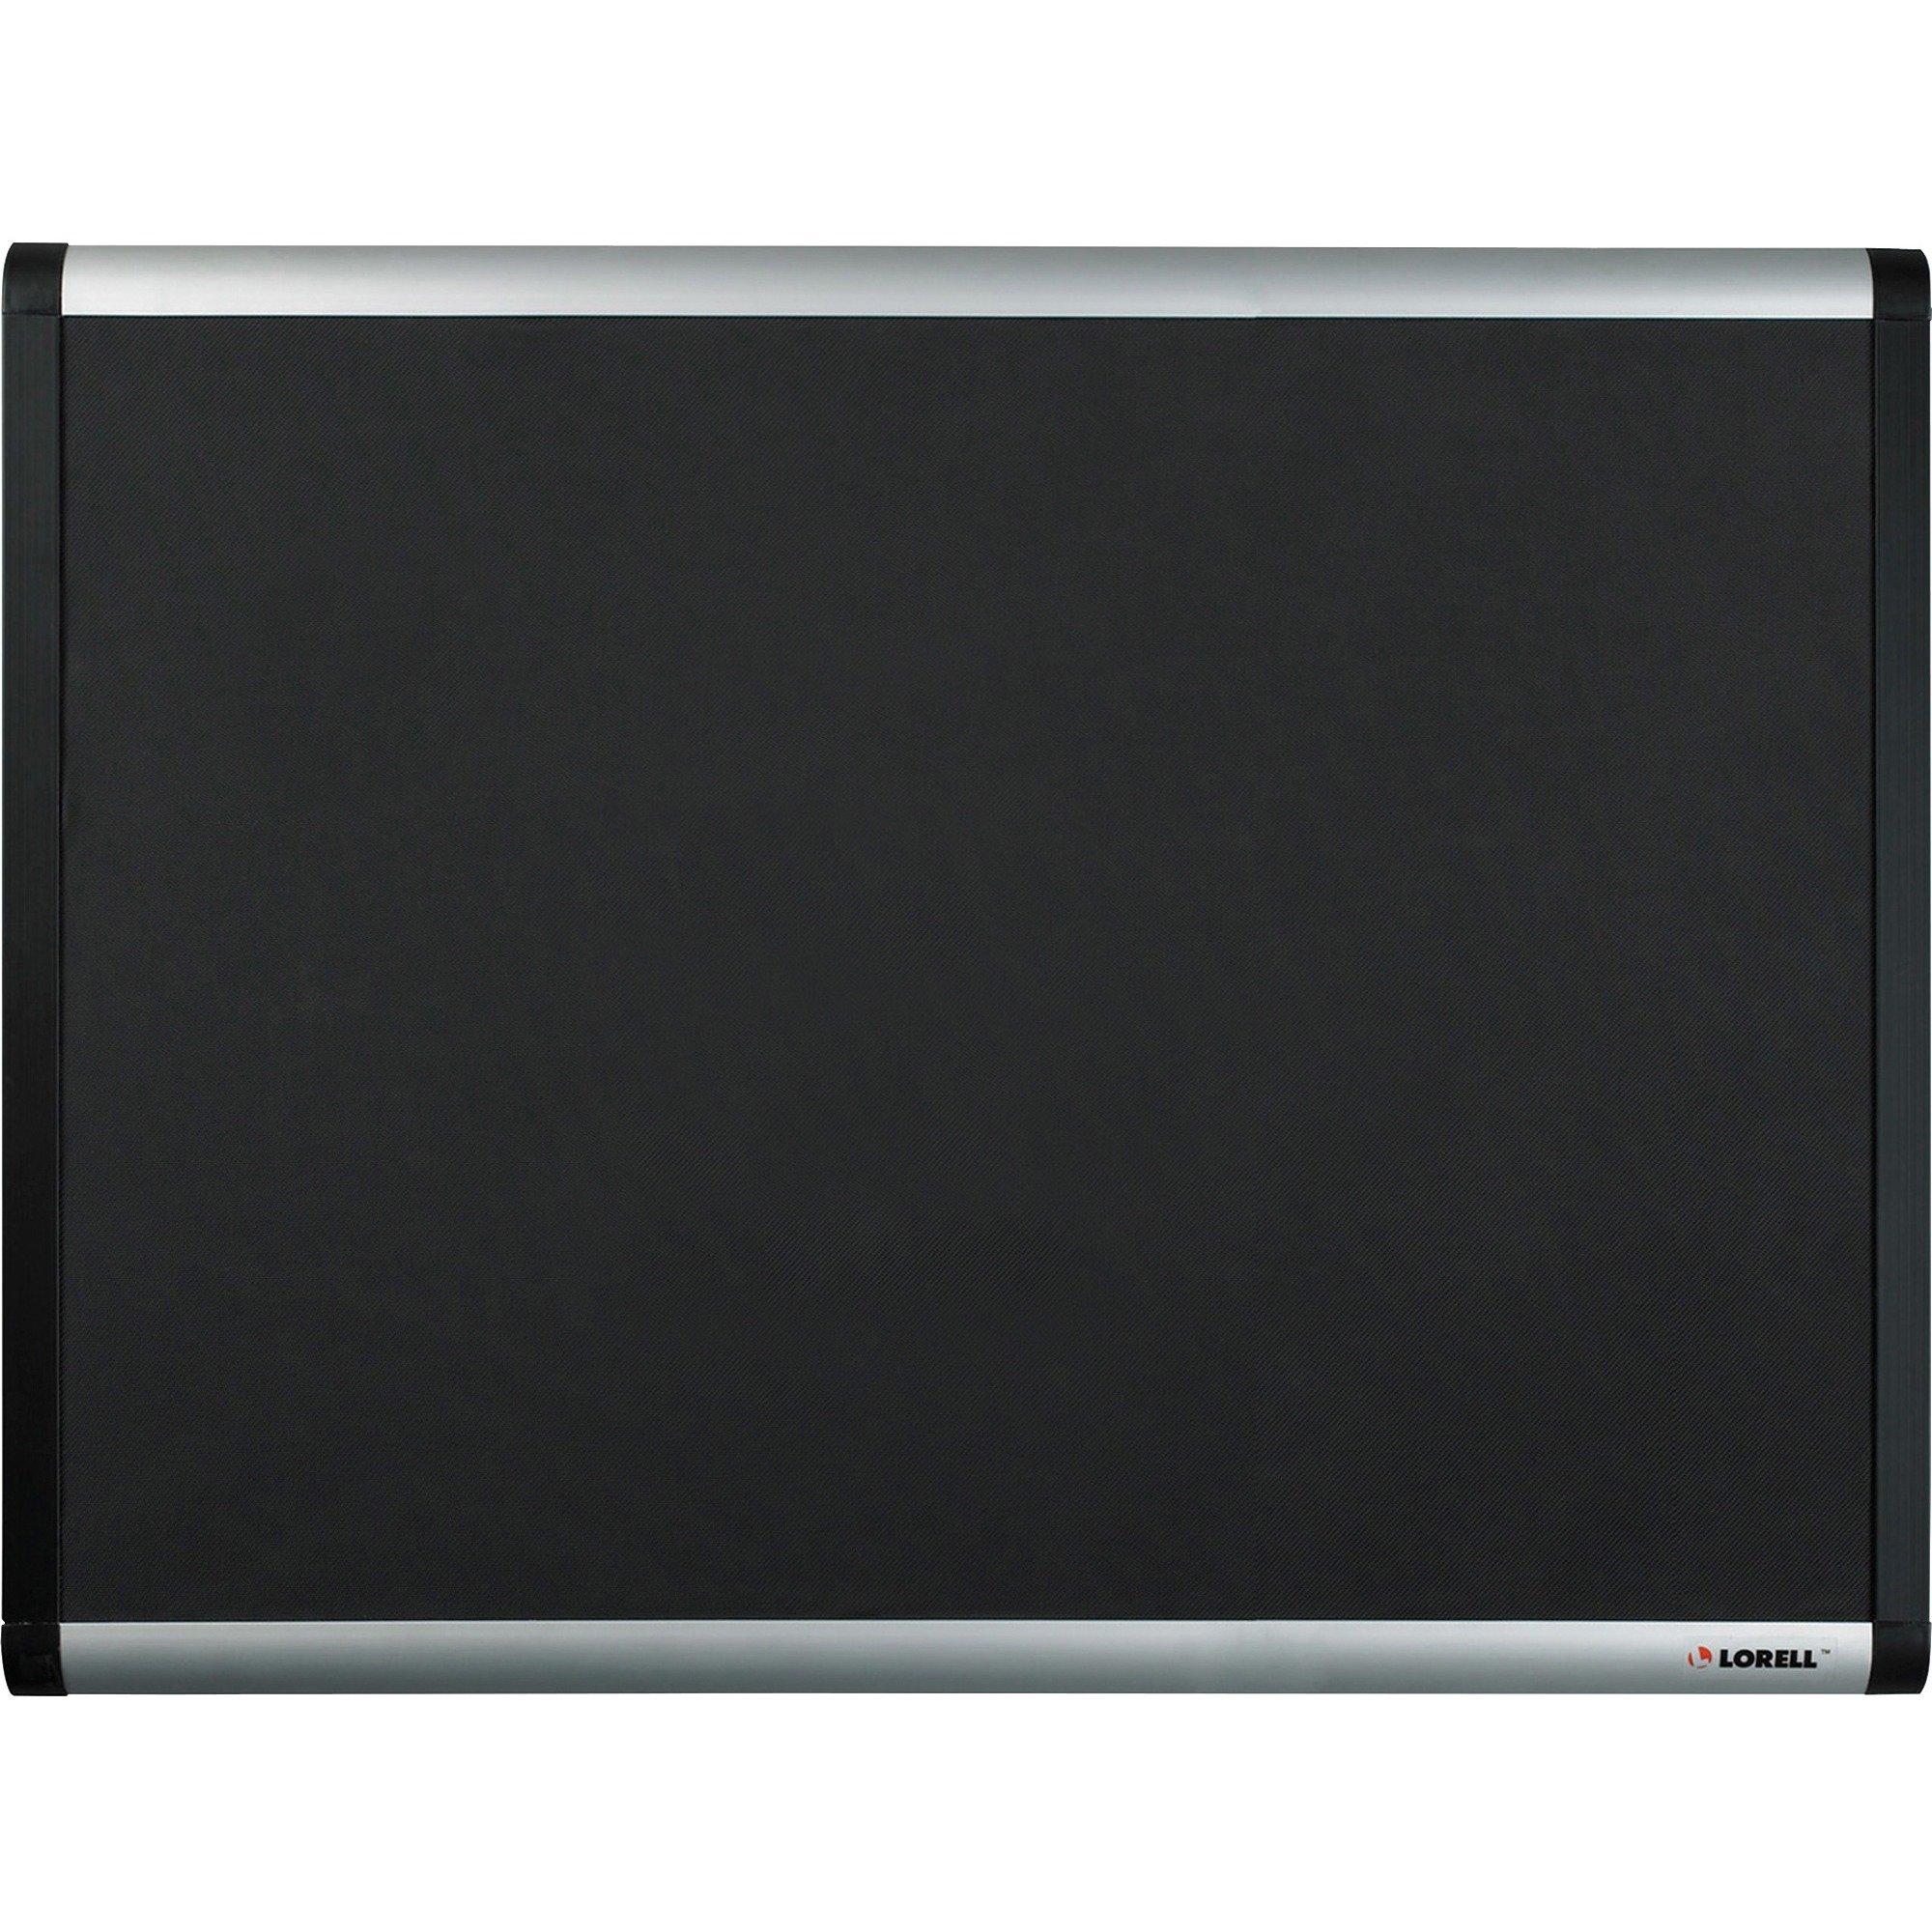 Lorell Bulletin Board, Mesh Fabric with Hardware, 4 by 6-Feet, Black